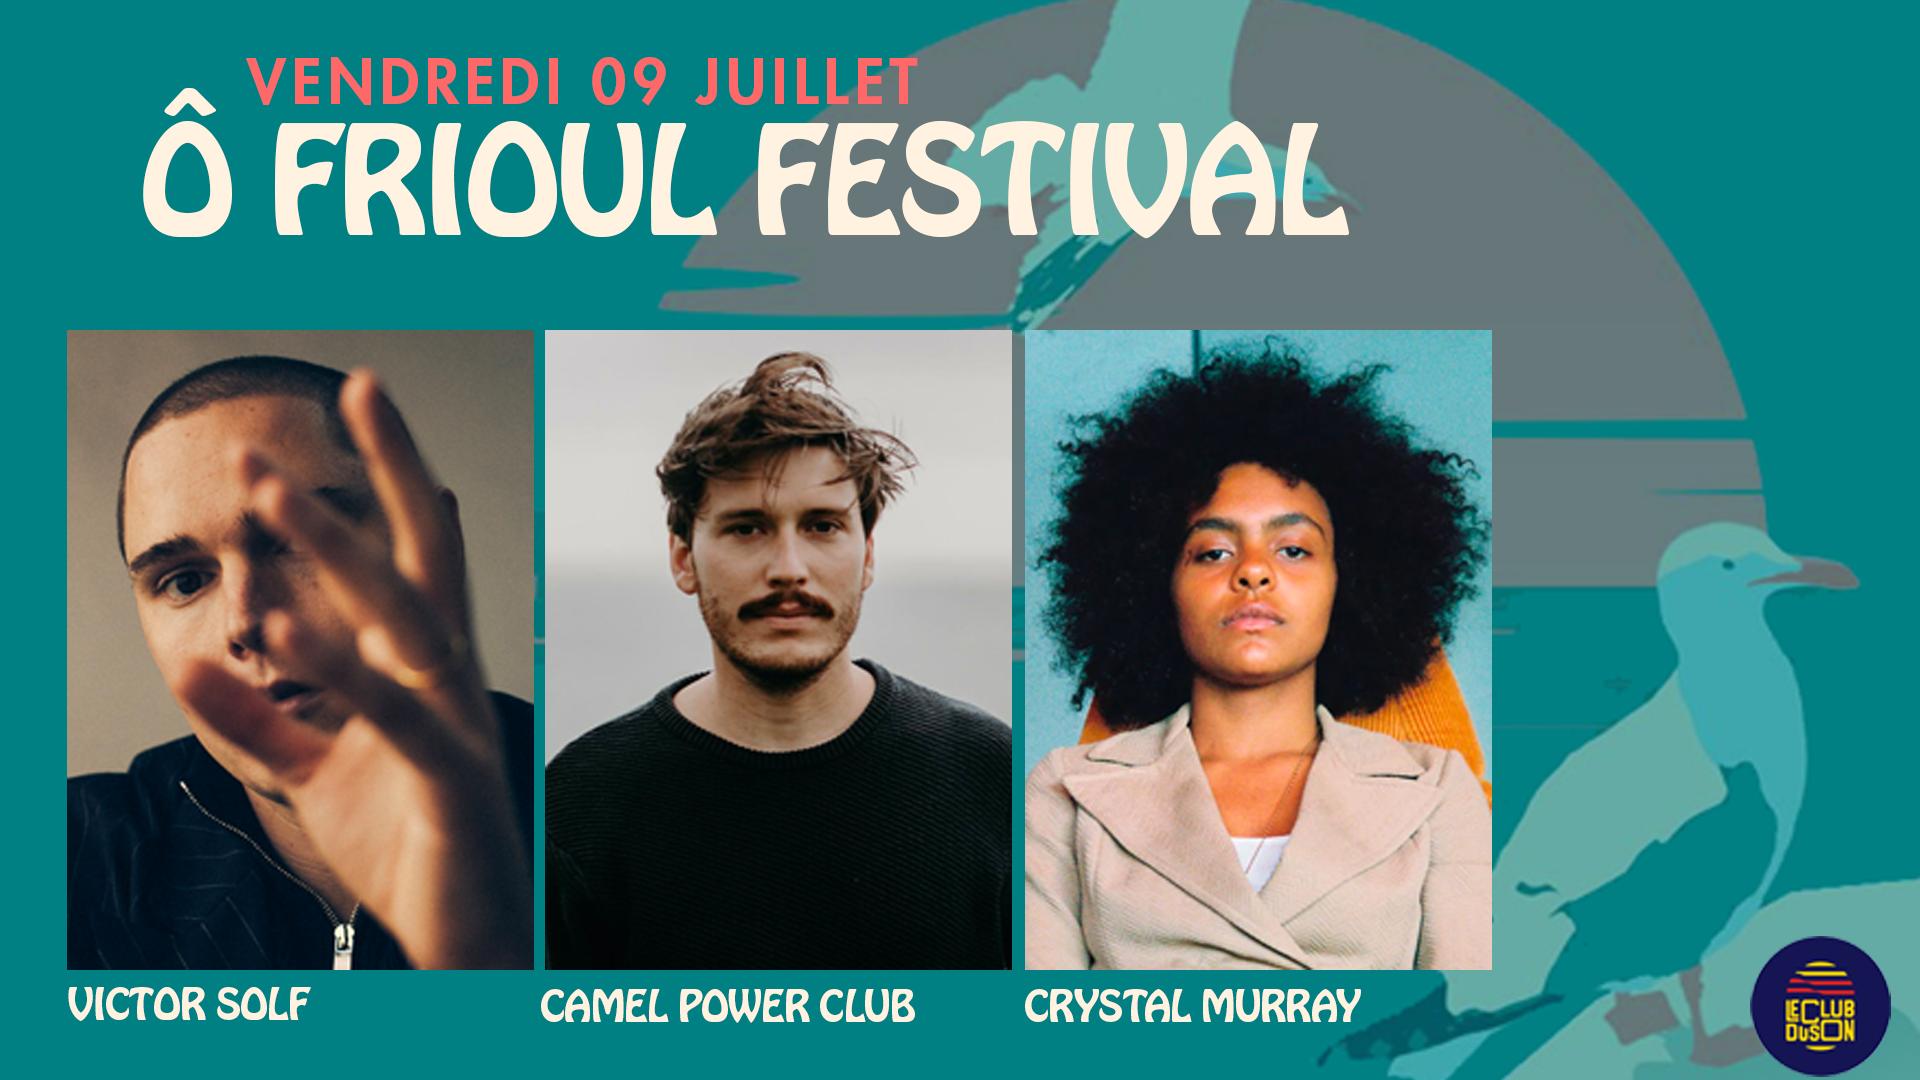 Ô Frioul Festival | Vendredi